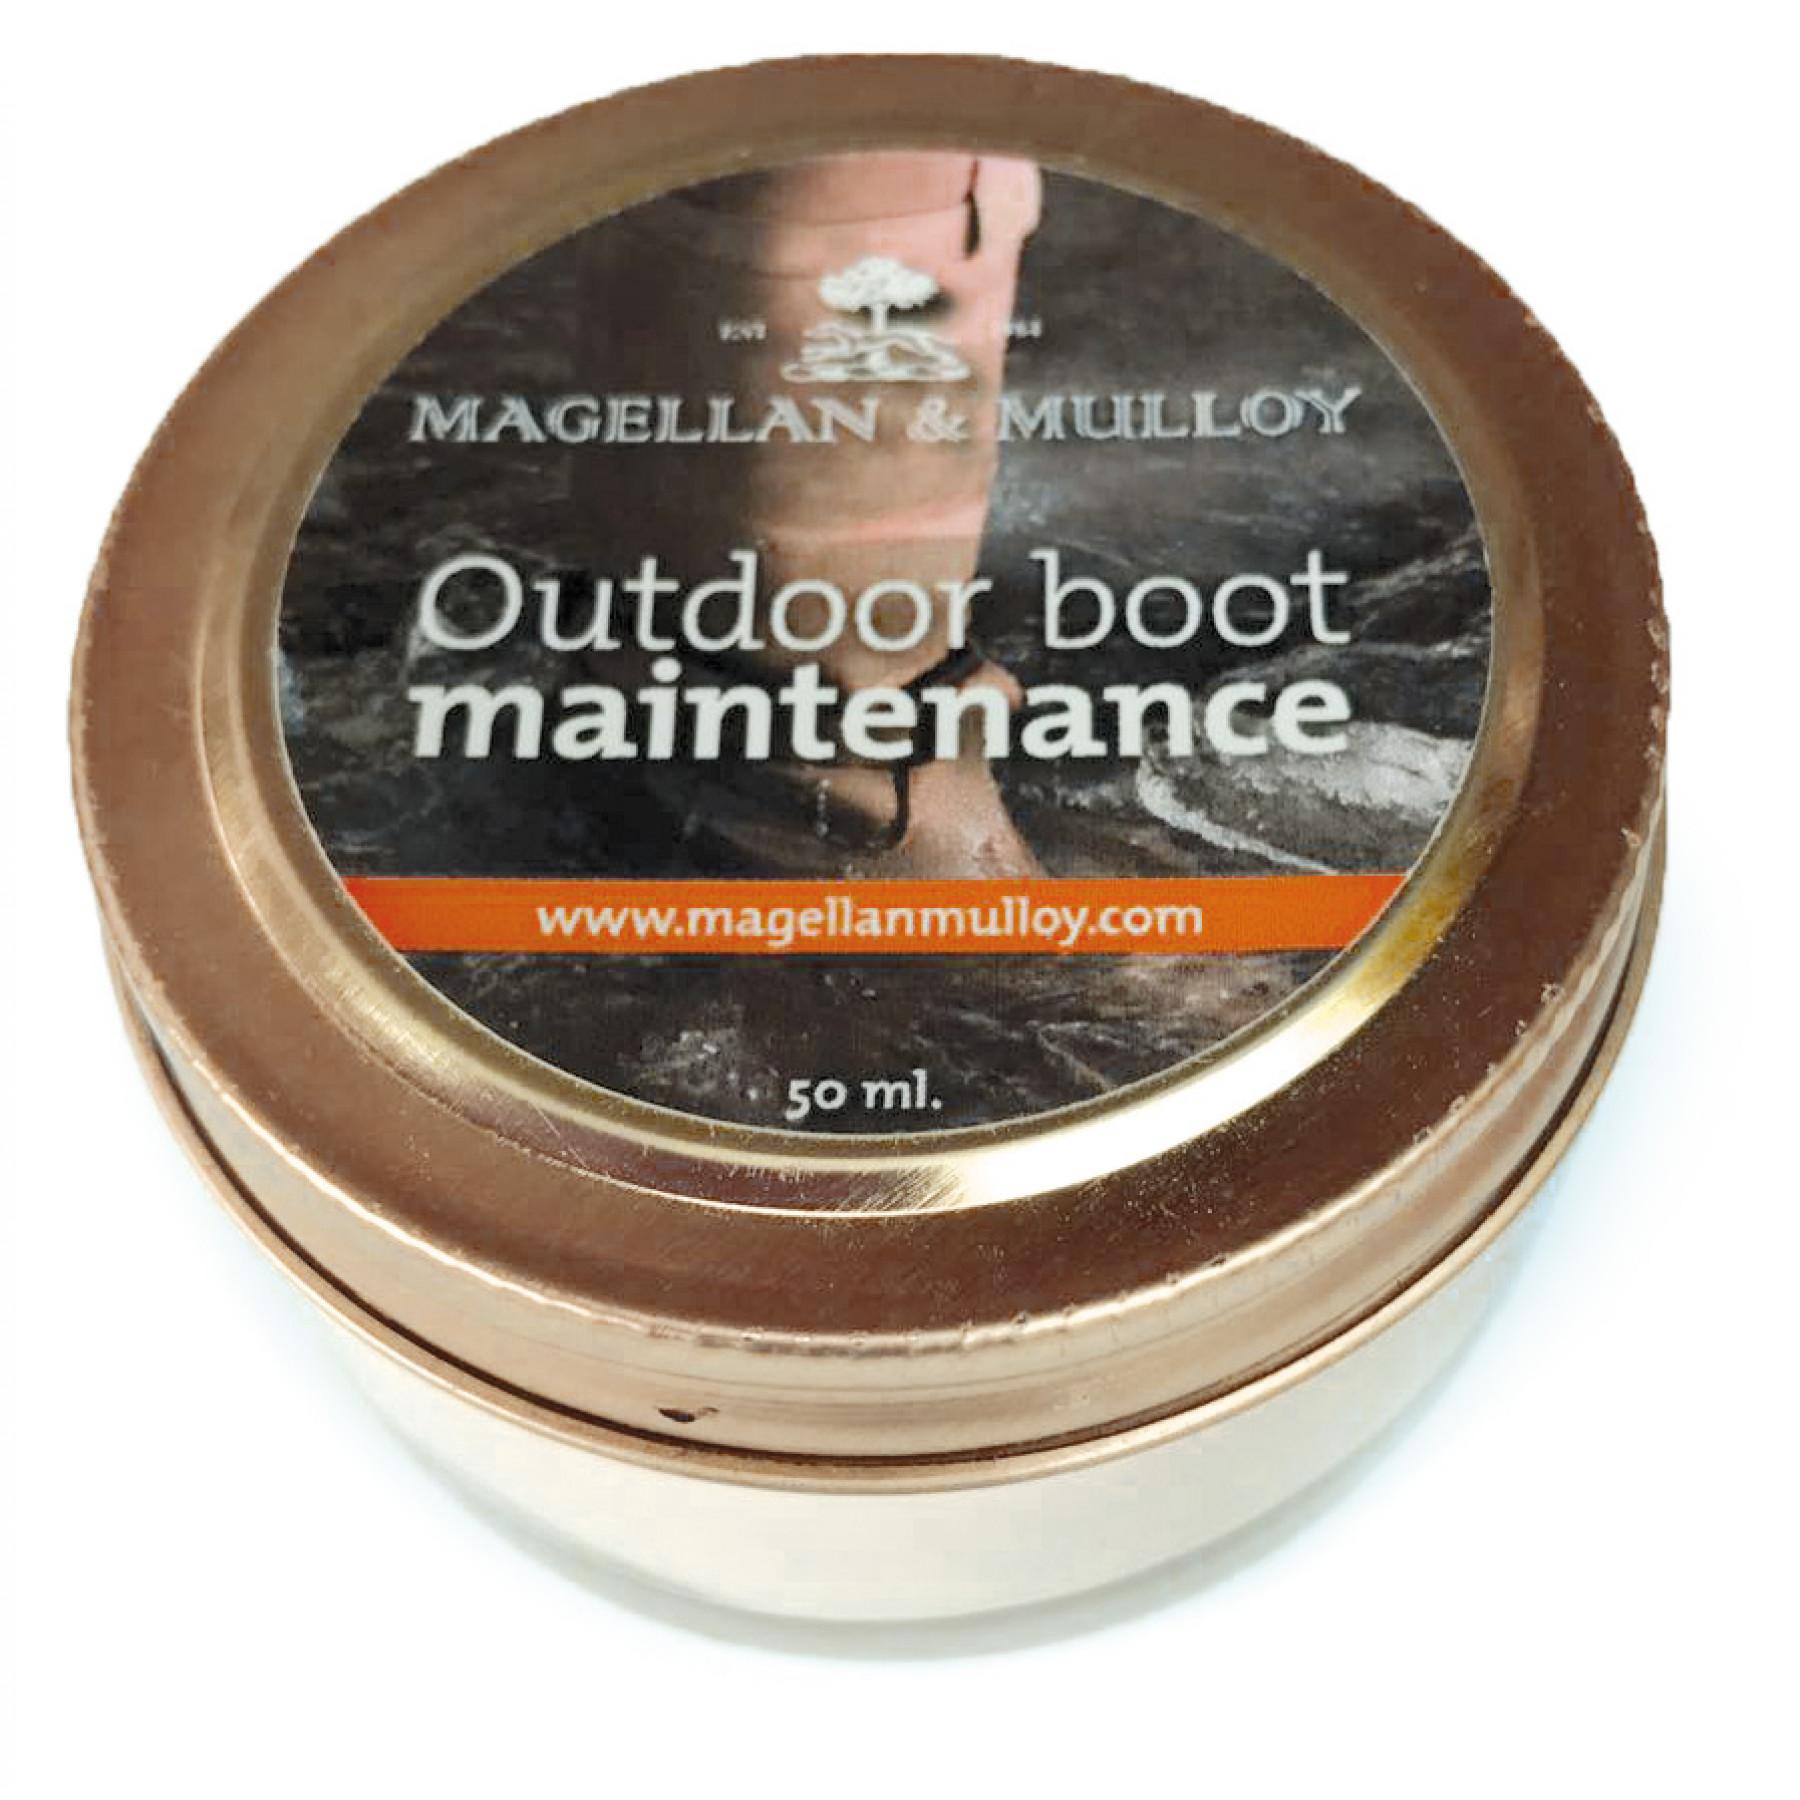 Outdoor Boot Maintenance, 50ml, 2 stuks